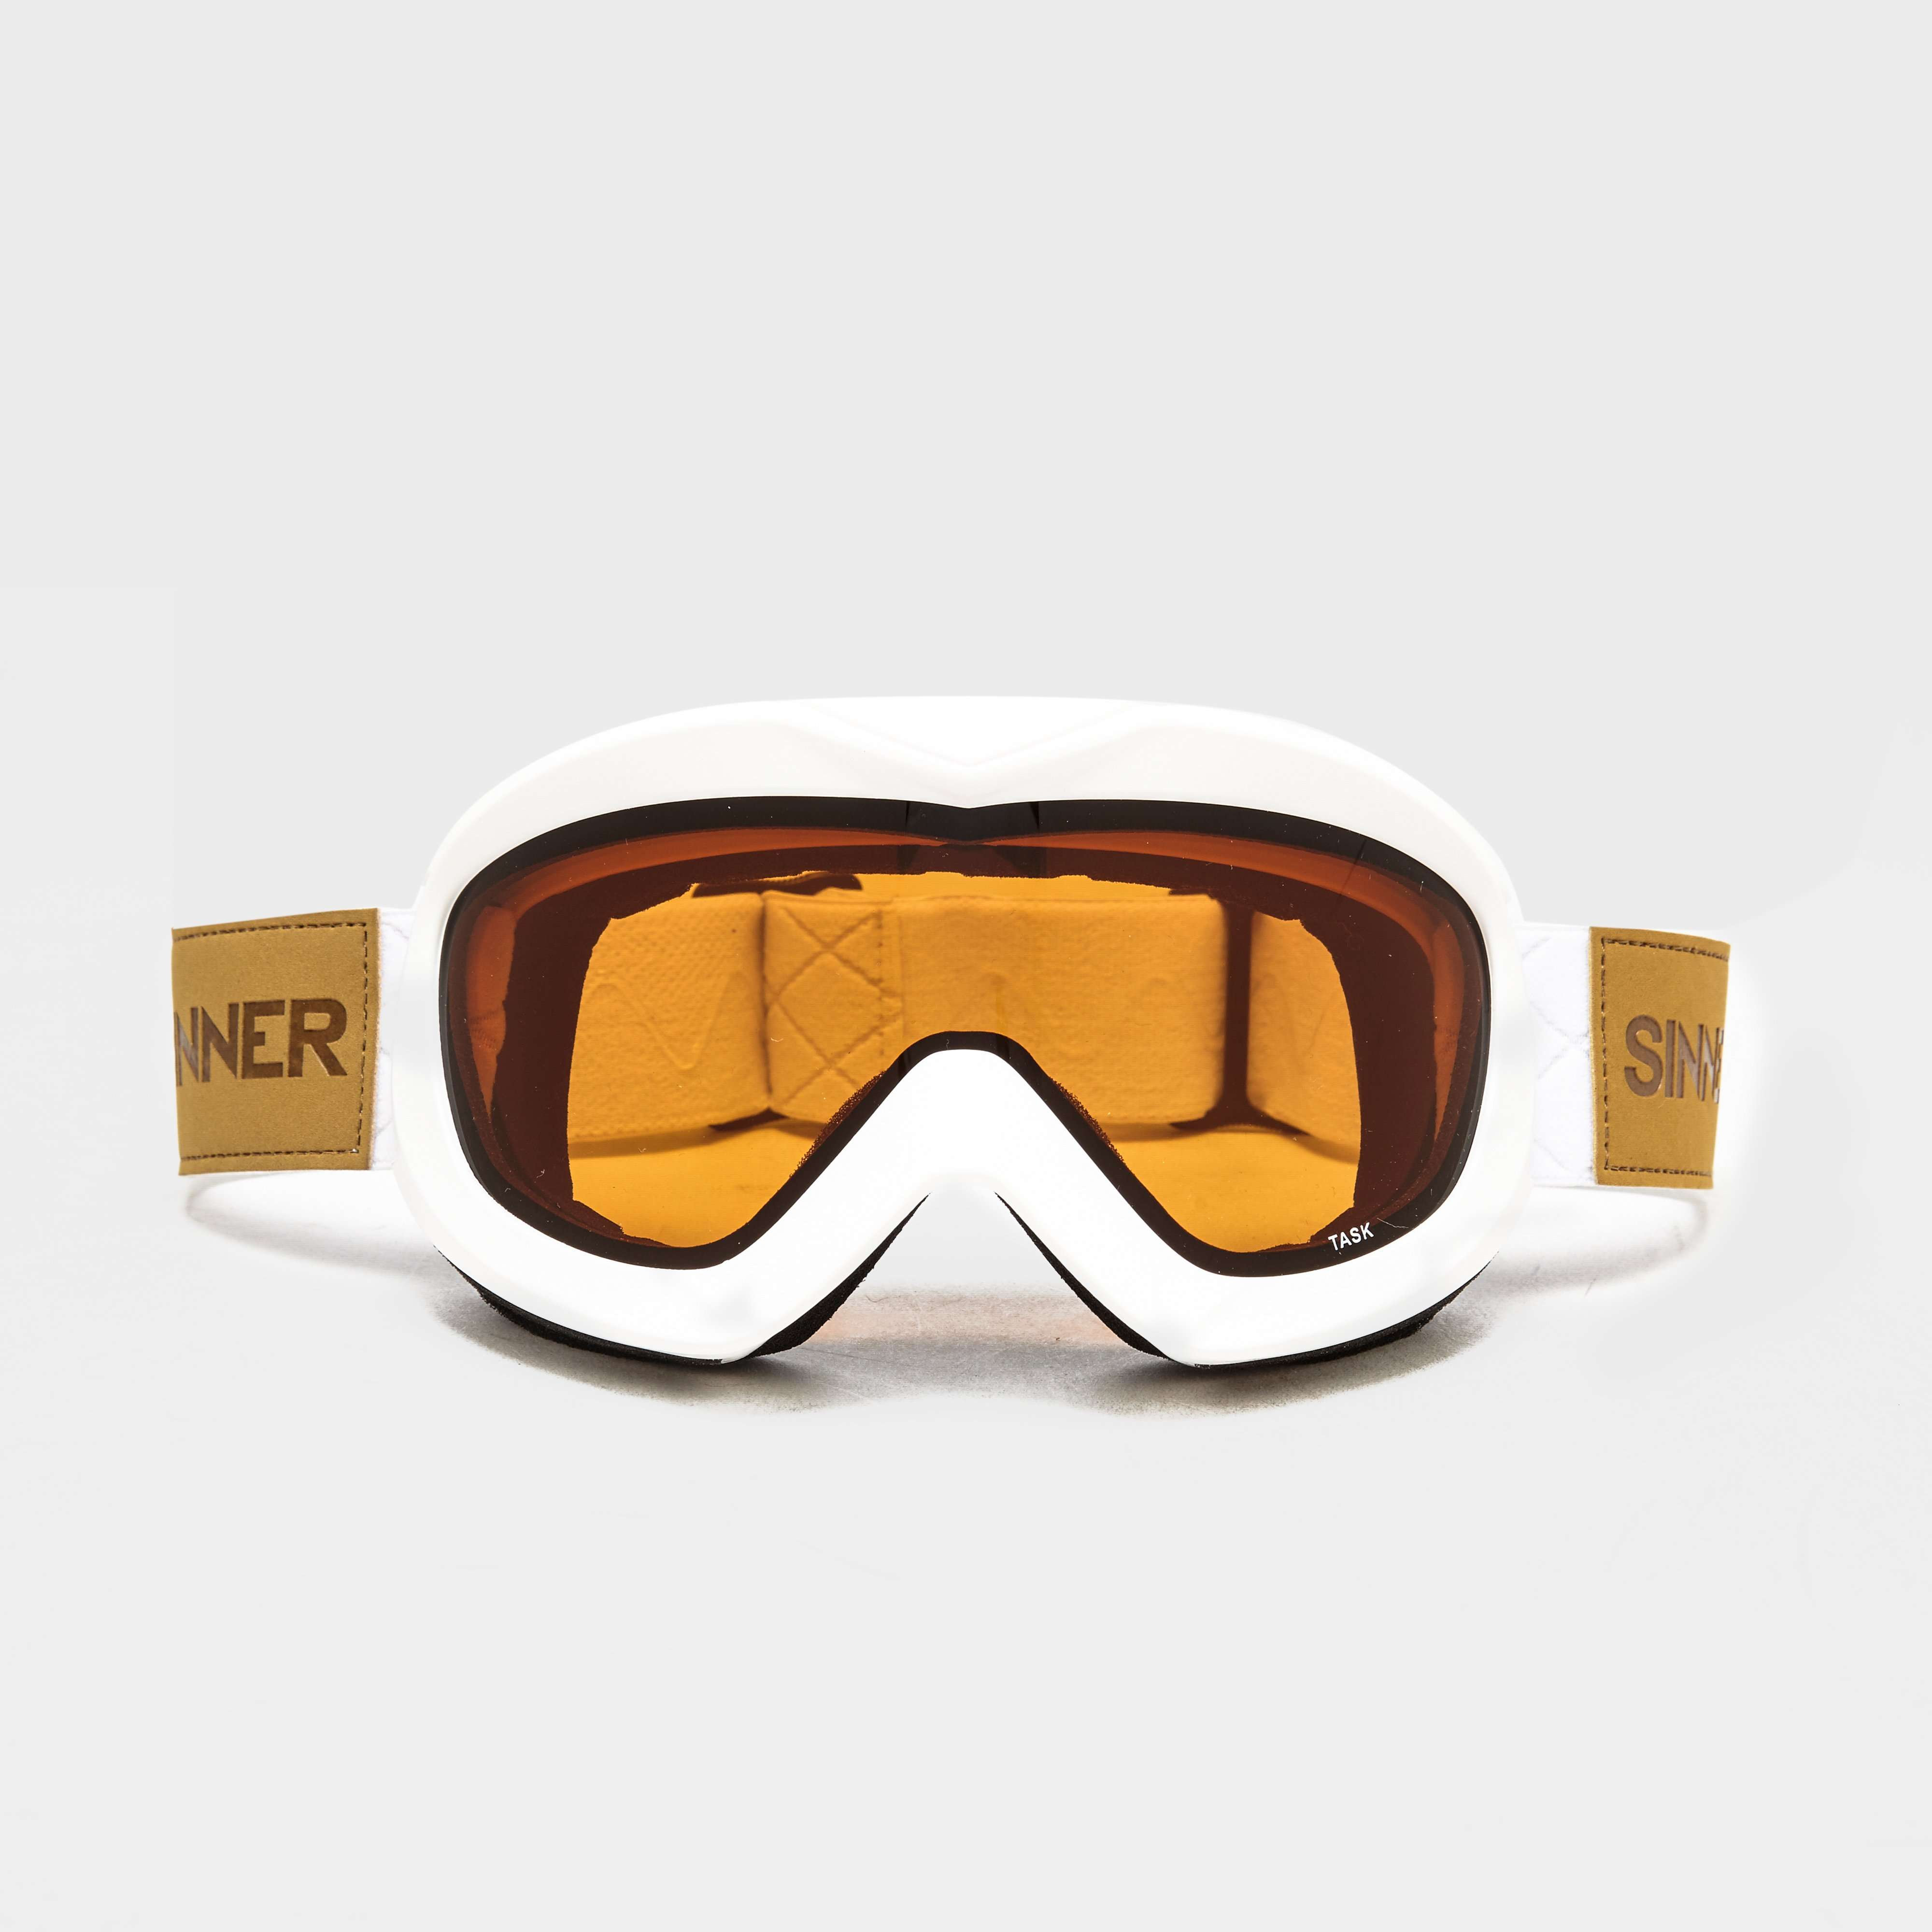 SINNER Task Ski Goggles